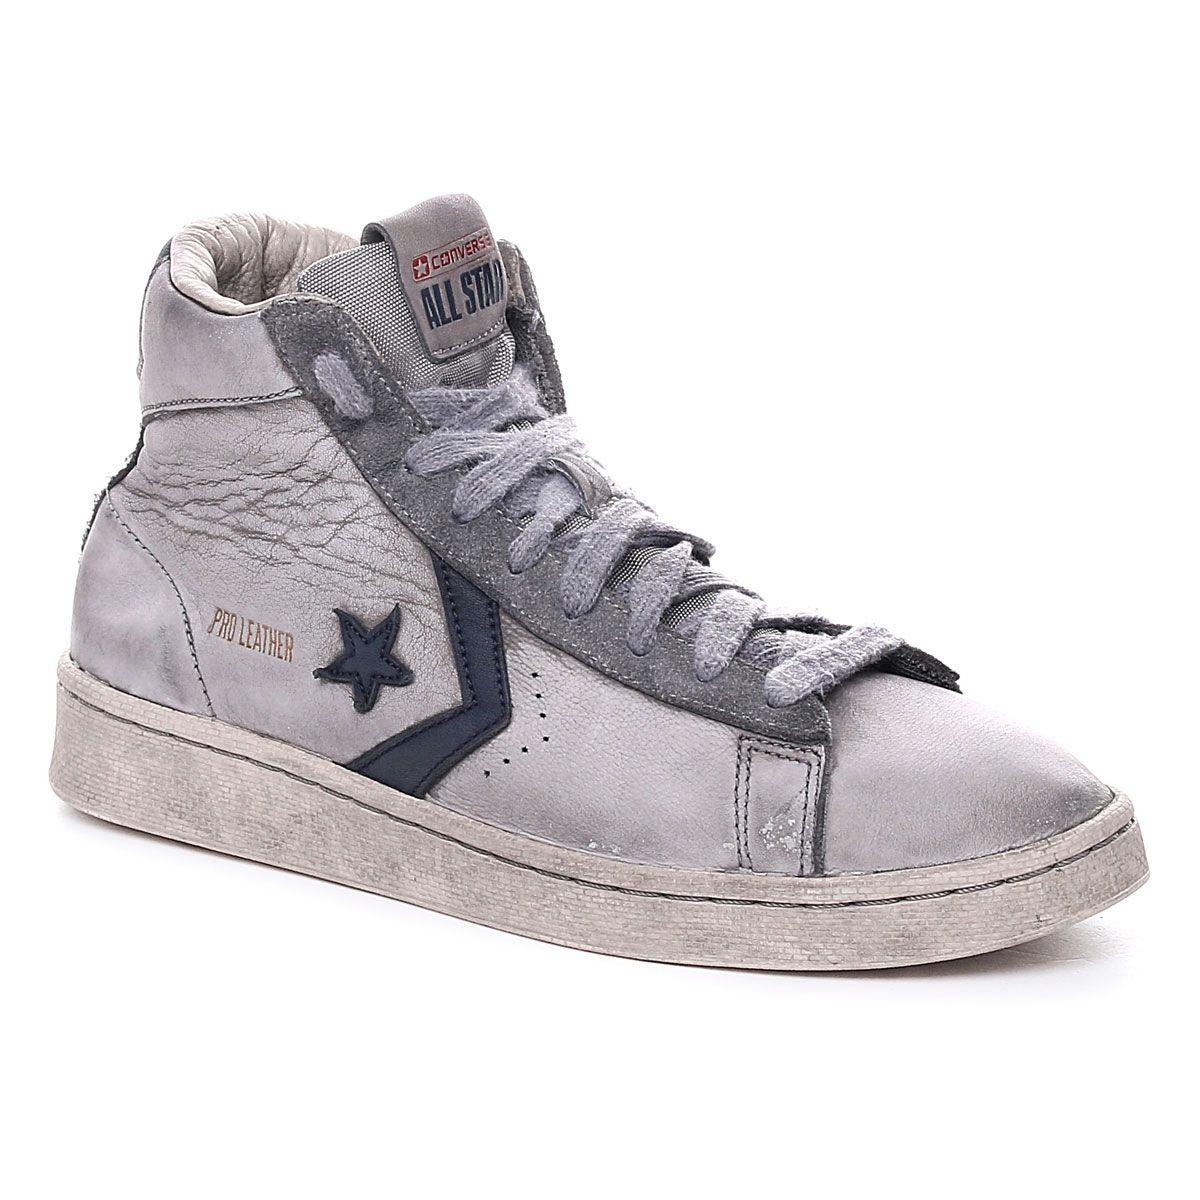 Converse Pro Leather Mid Og Limited Bianco Blu